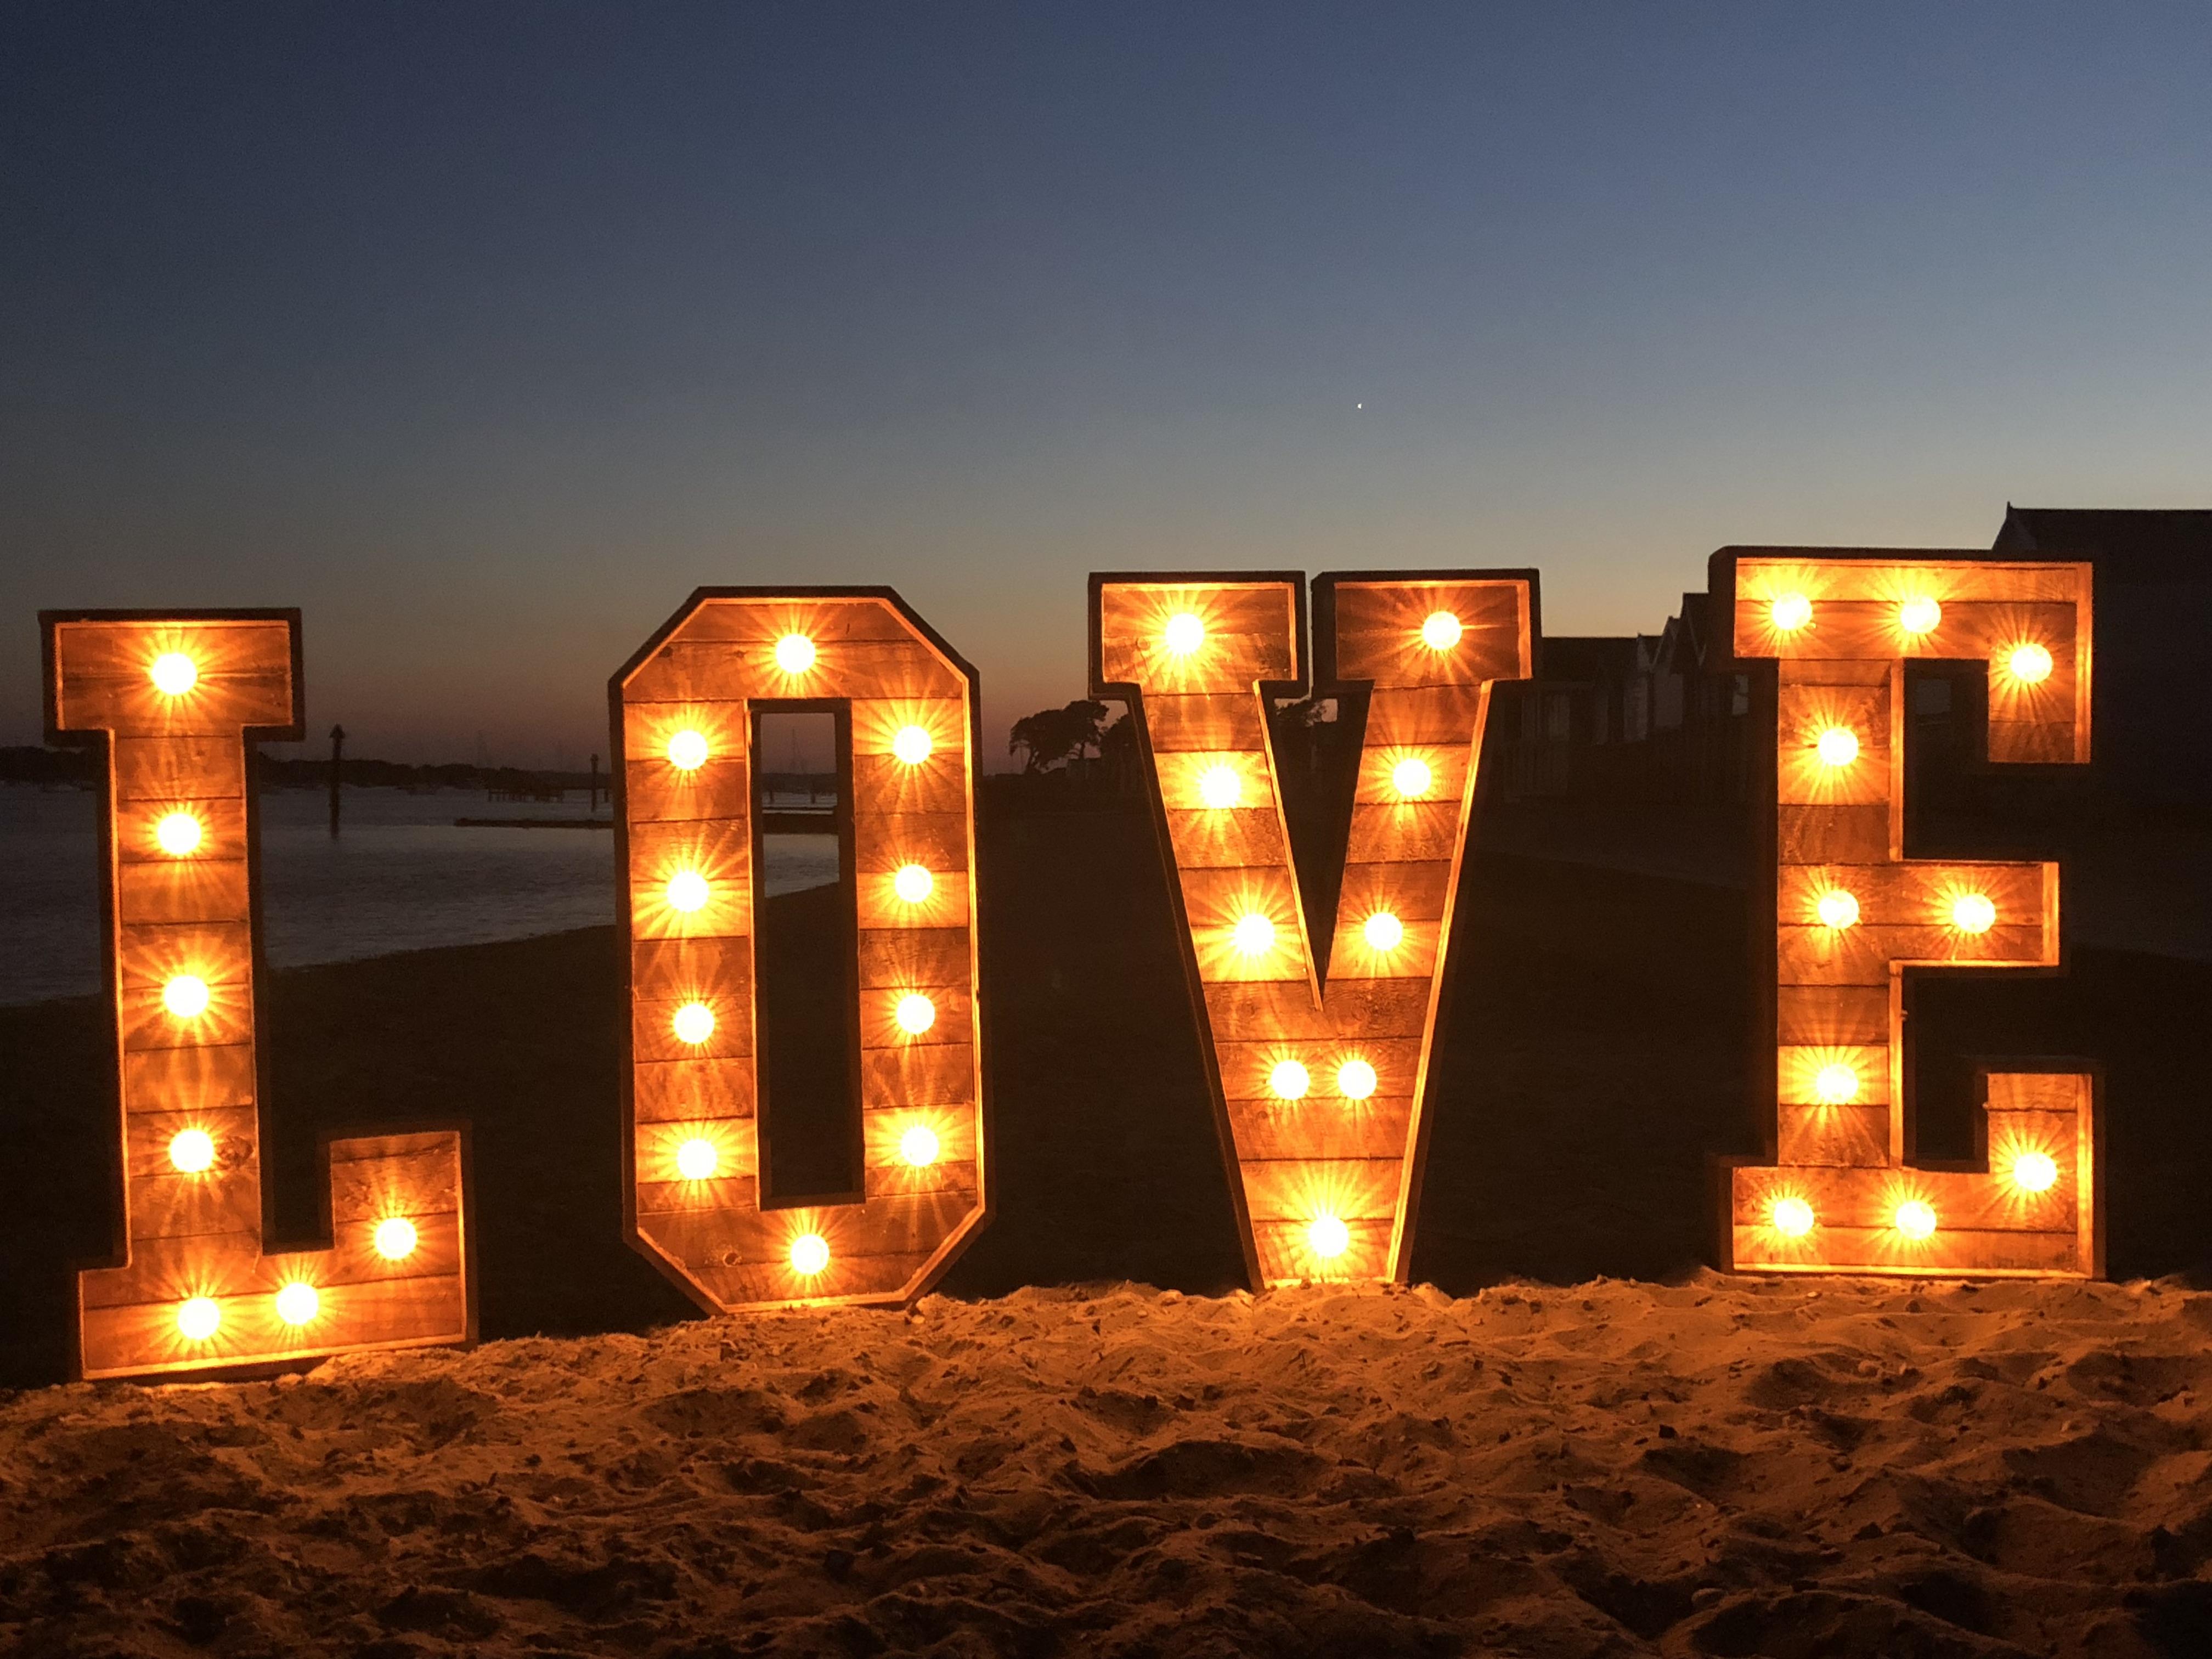 Promo Lit Up Letters Light Up Letters Poole, Dorset